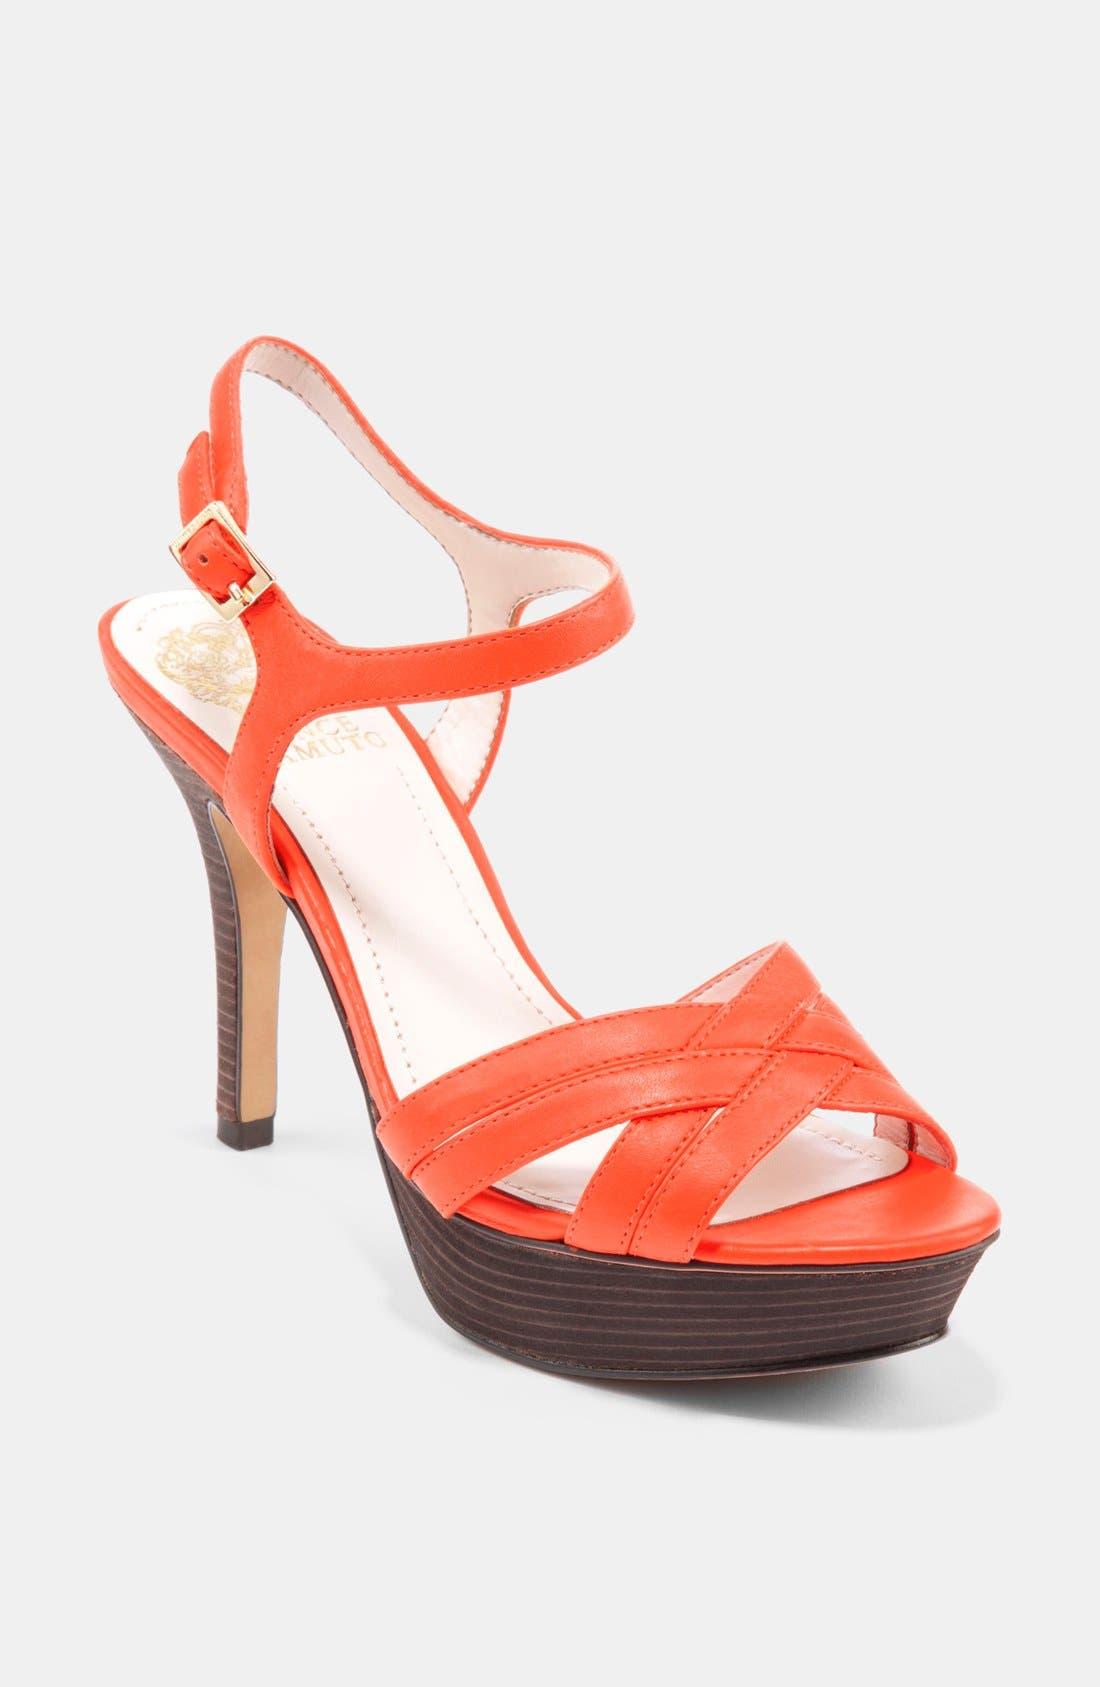 Main Image - Vince Camuto 'Paden' Sandal